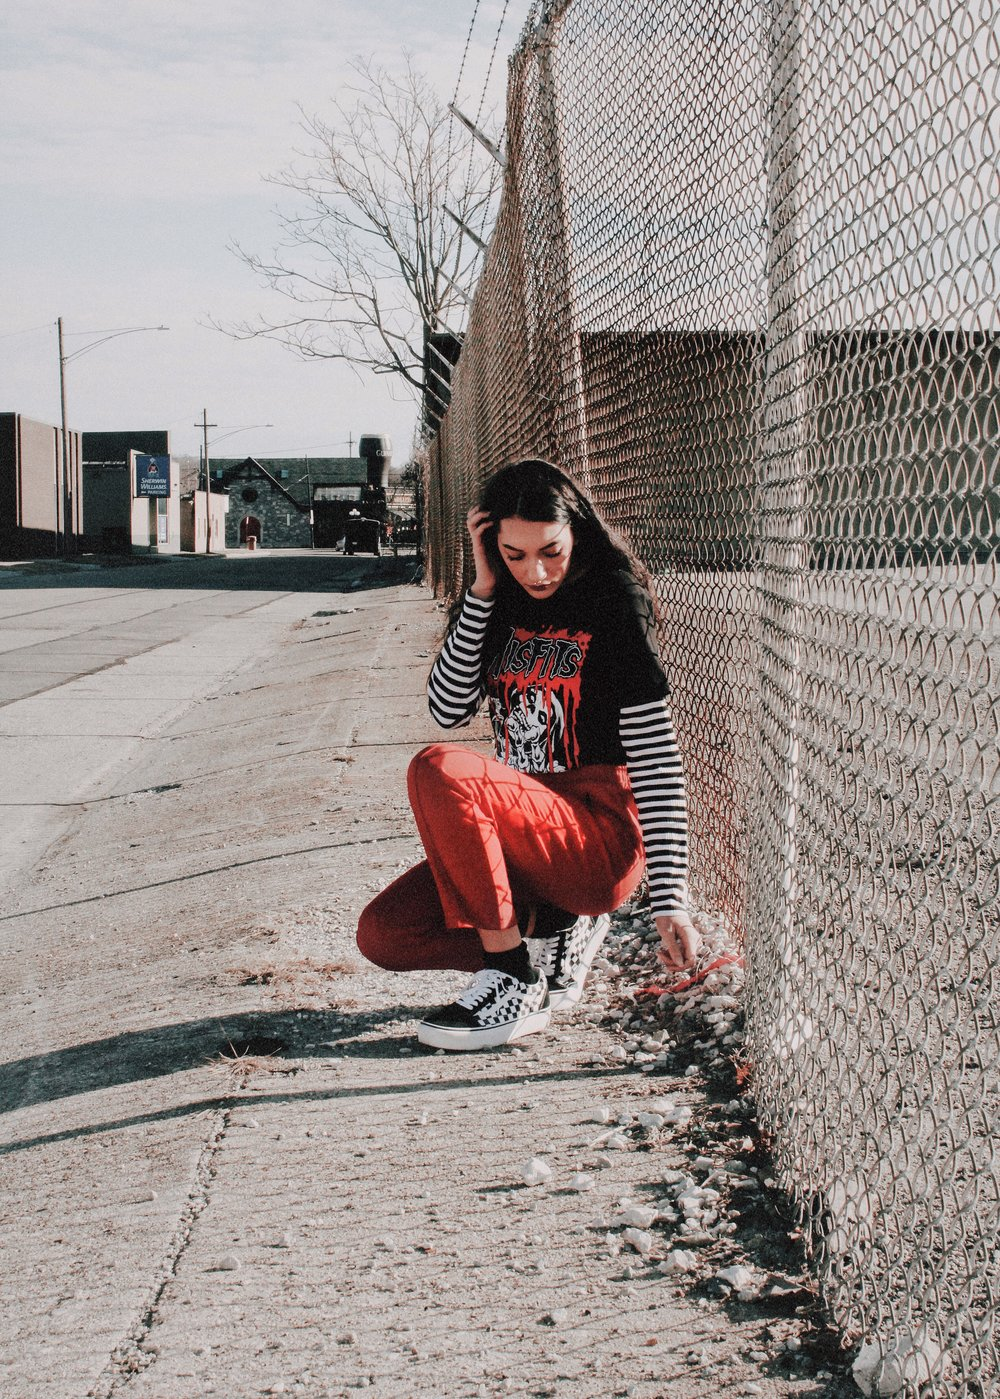 Misfit_Grunge_outfit_Aniyahlationn05